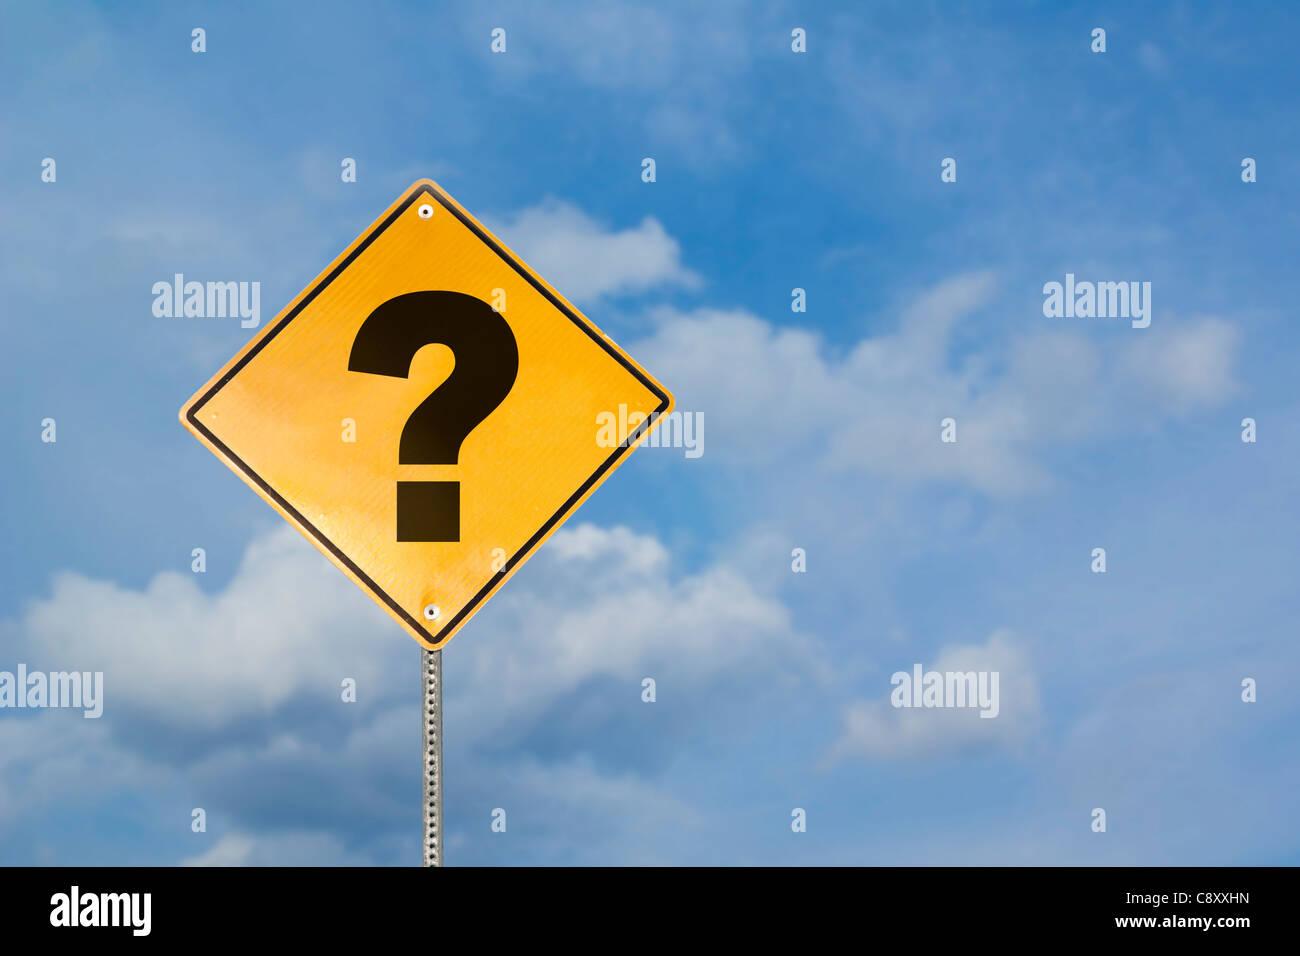 USA, Illinois, Metamora, question mark sign against sky - Stock Image